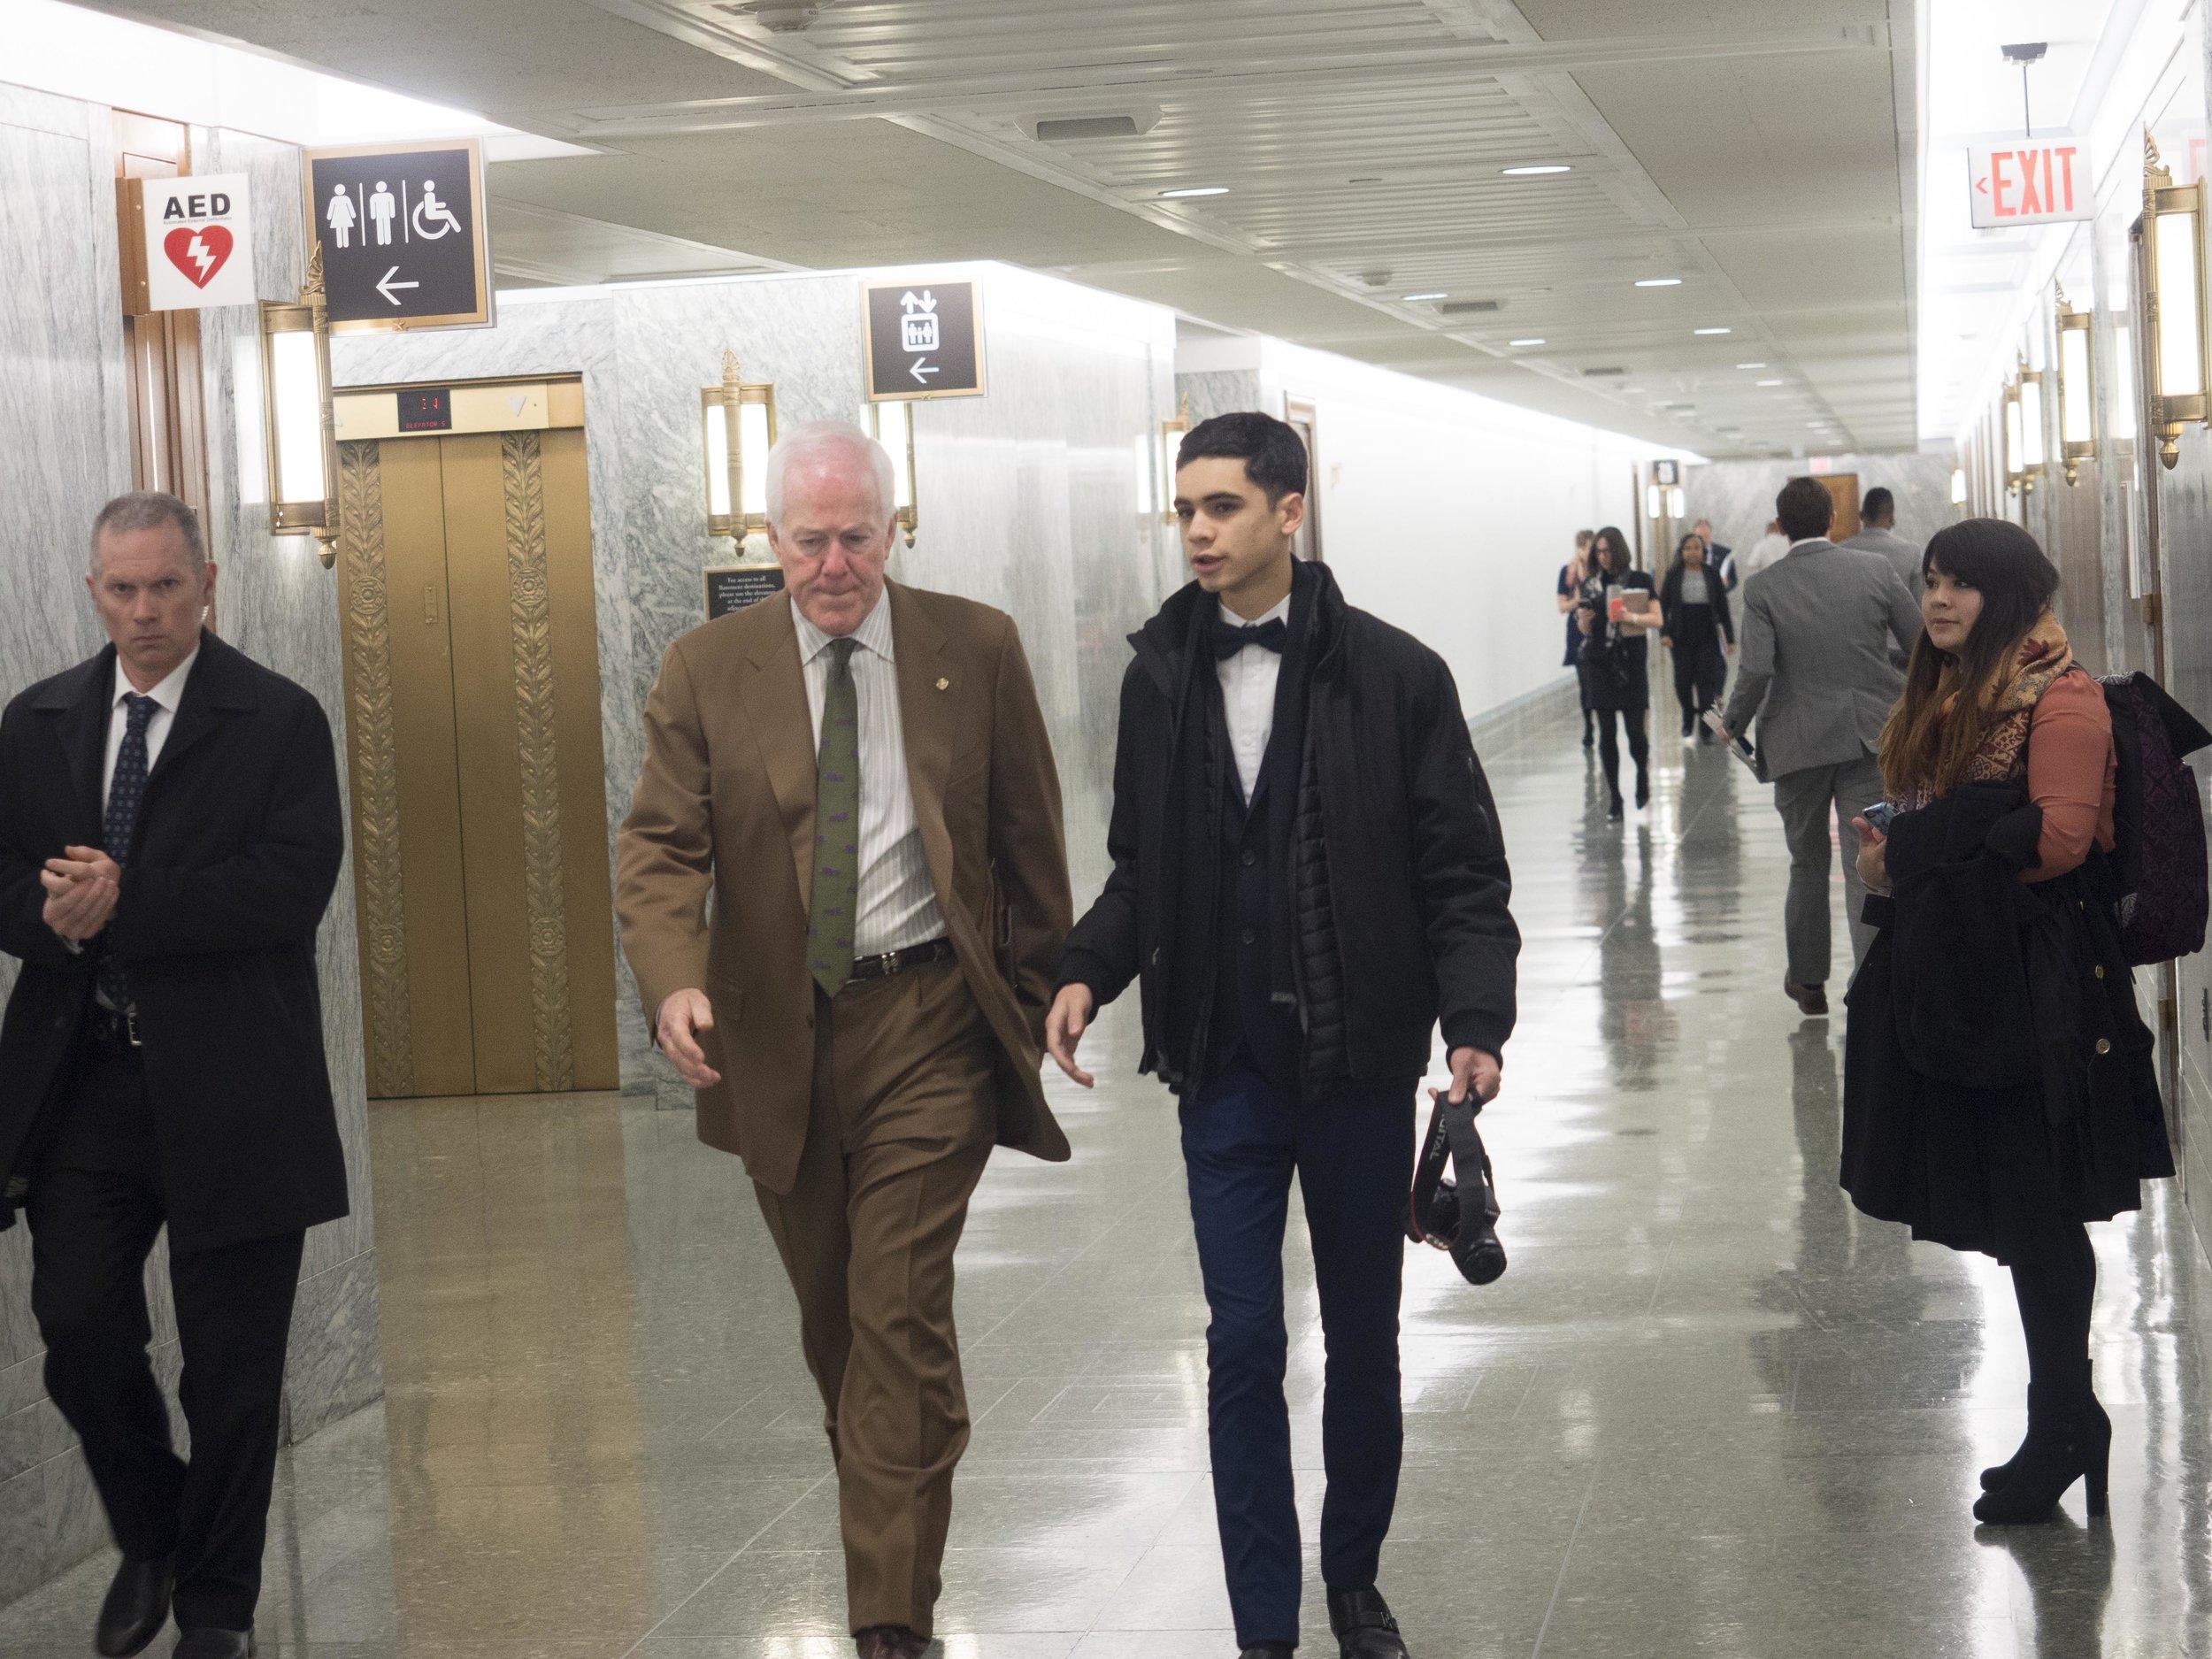 Saul speaking with Sen. John Cornyn (R) in the Senate Building